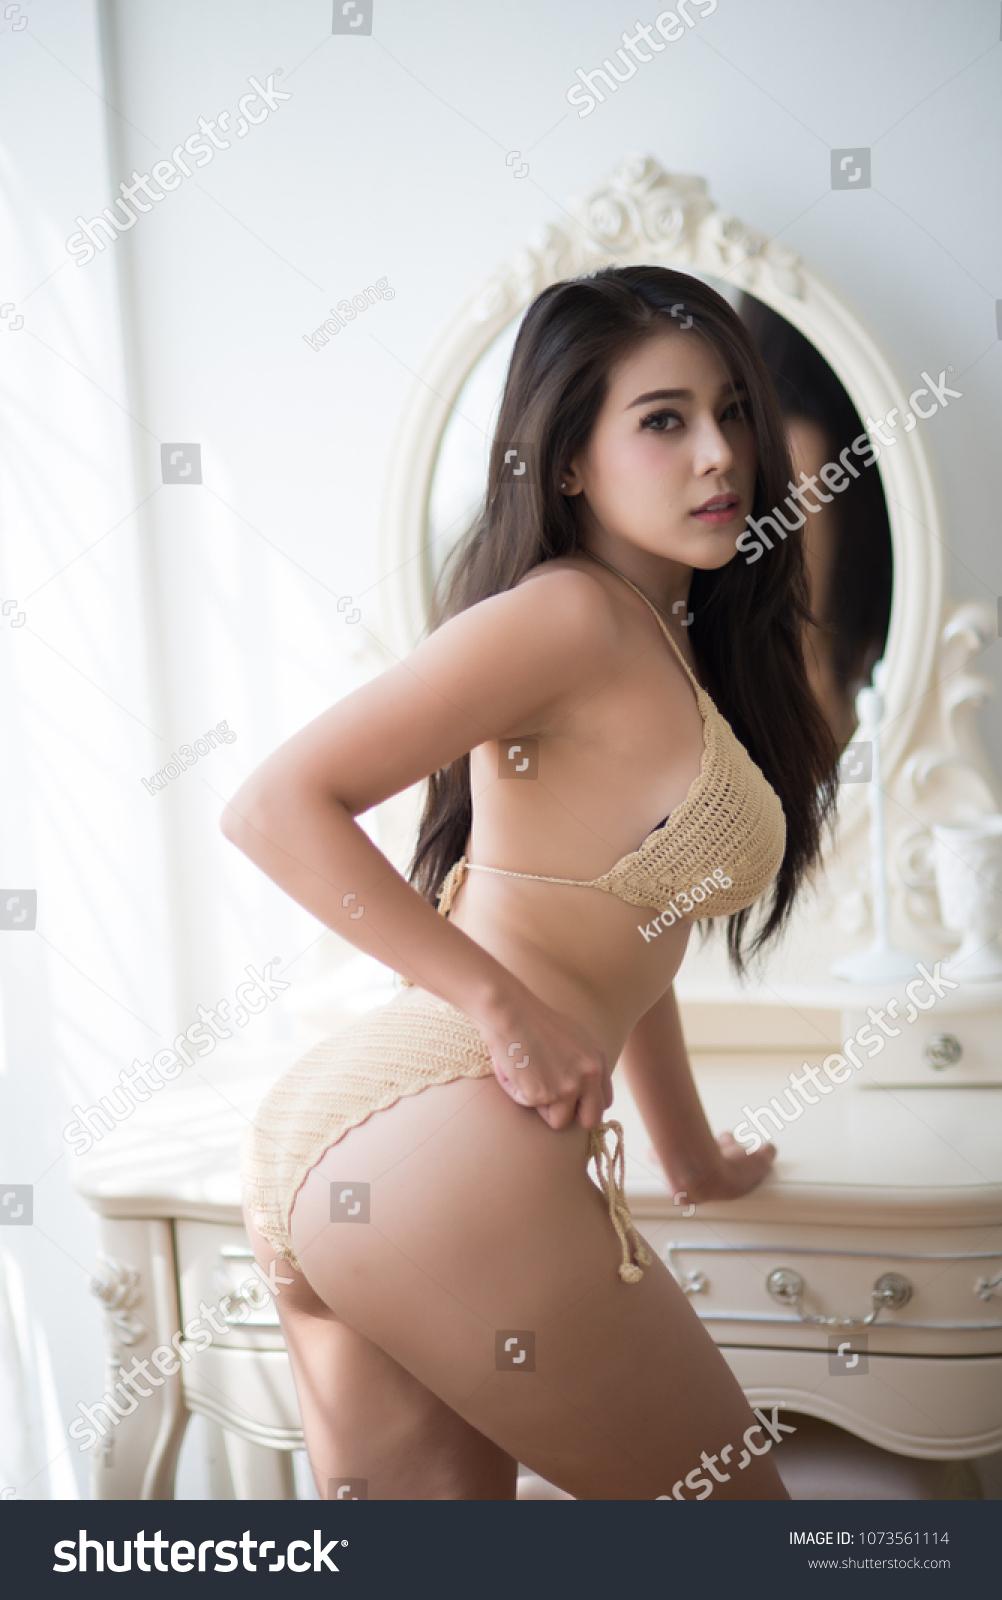 Asian sexy nude Pinterest